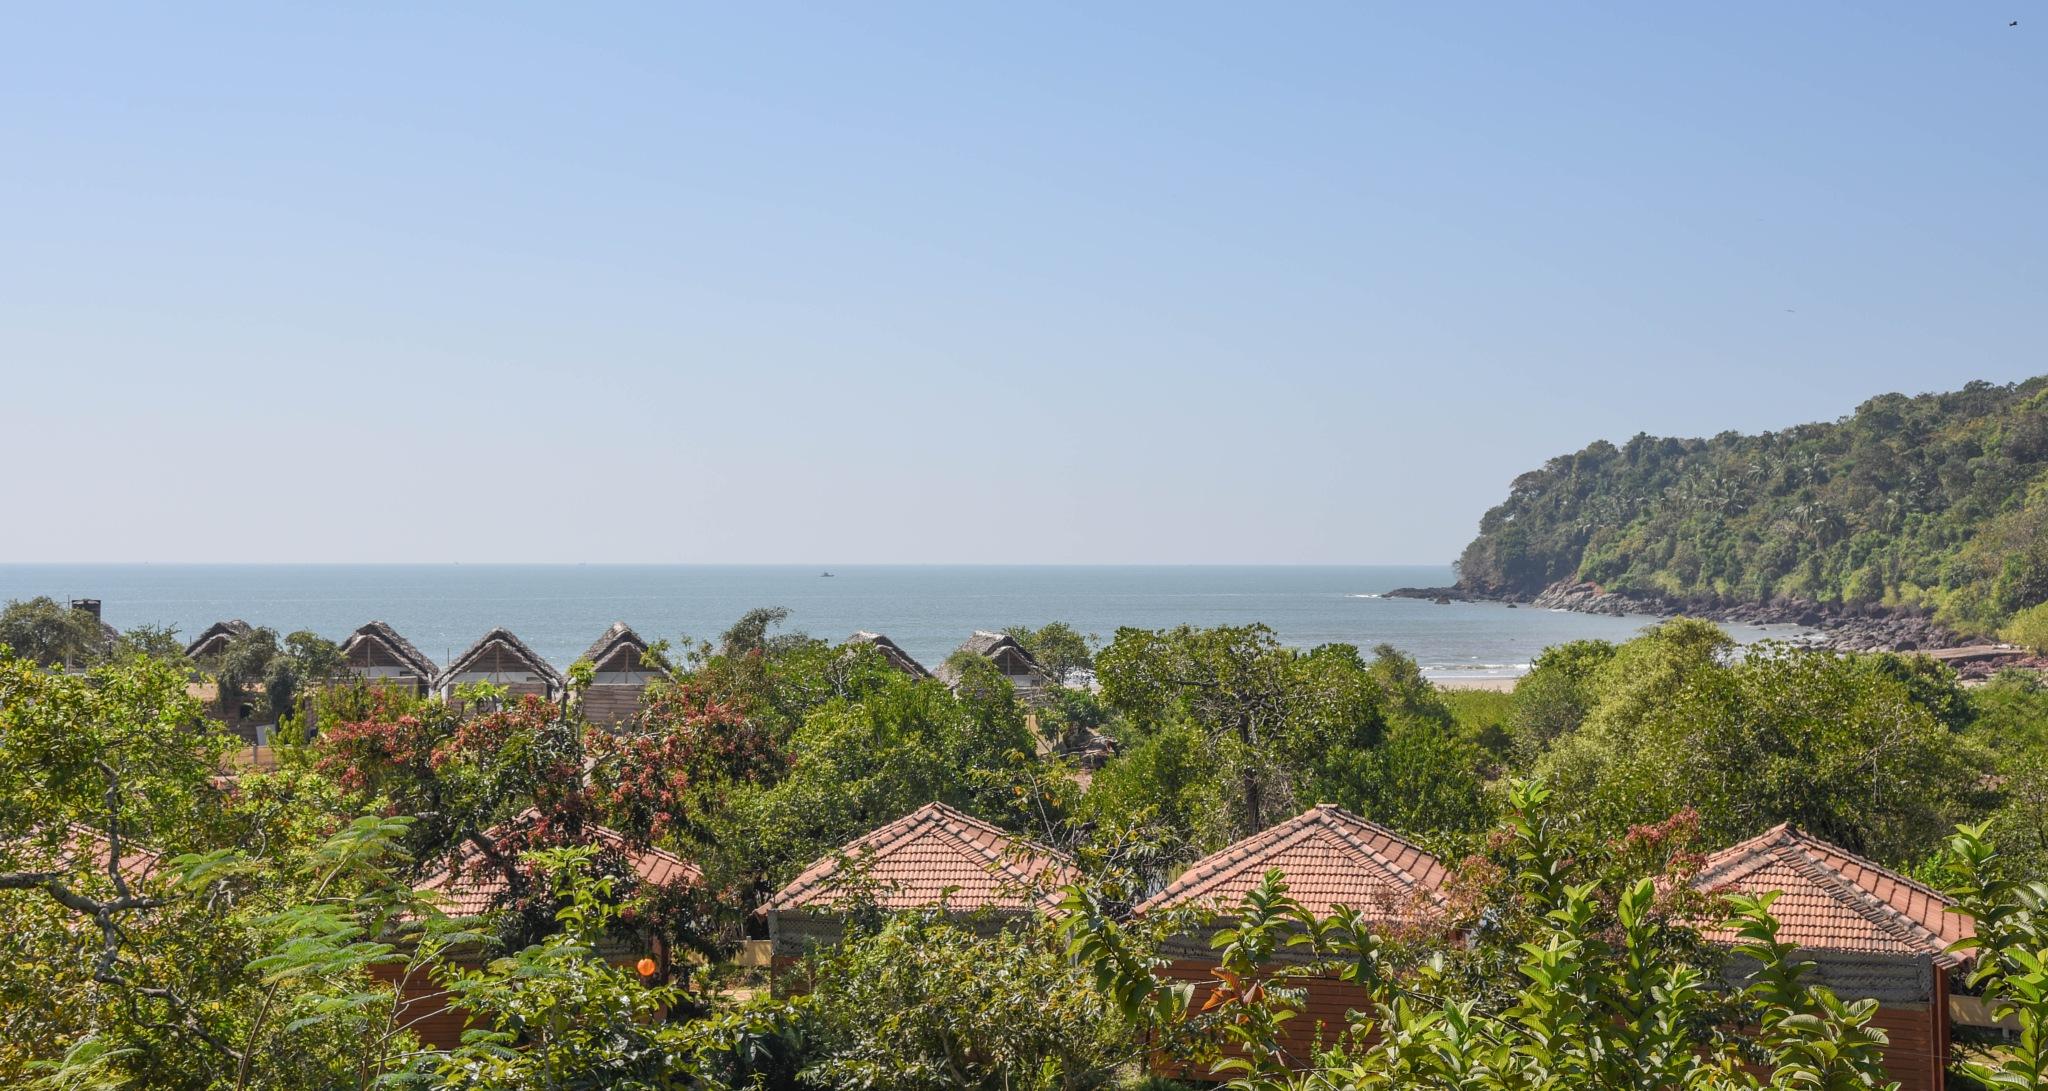 Beach huts in Goa by mapai